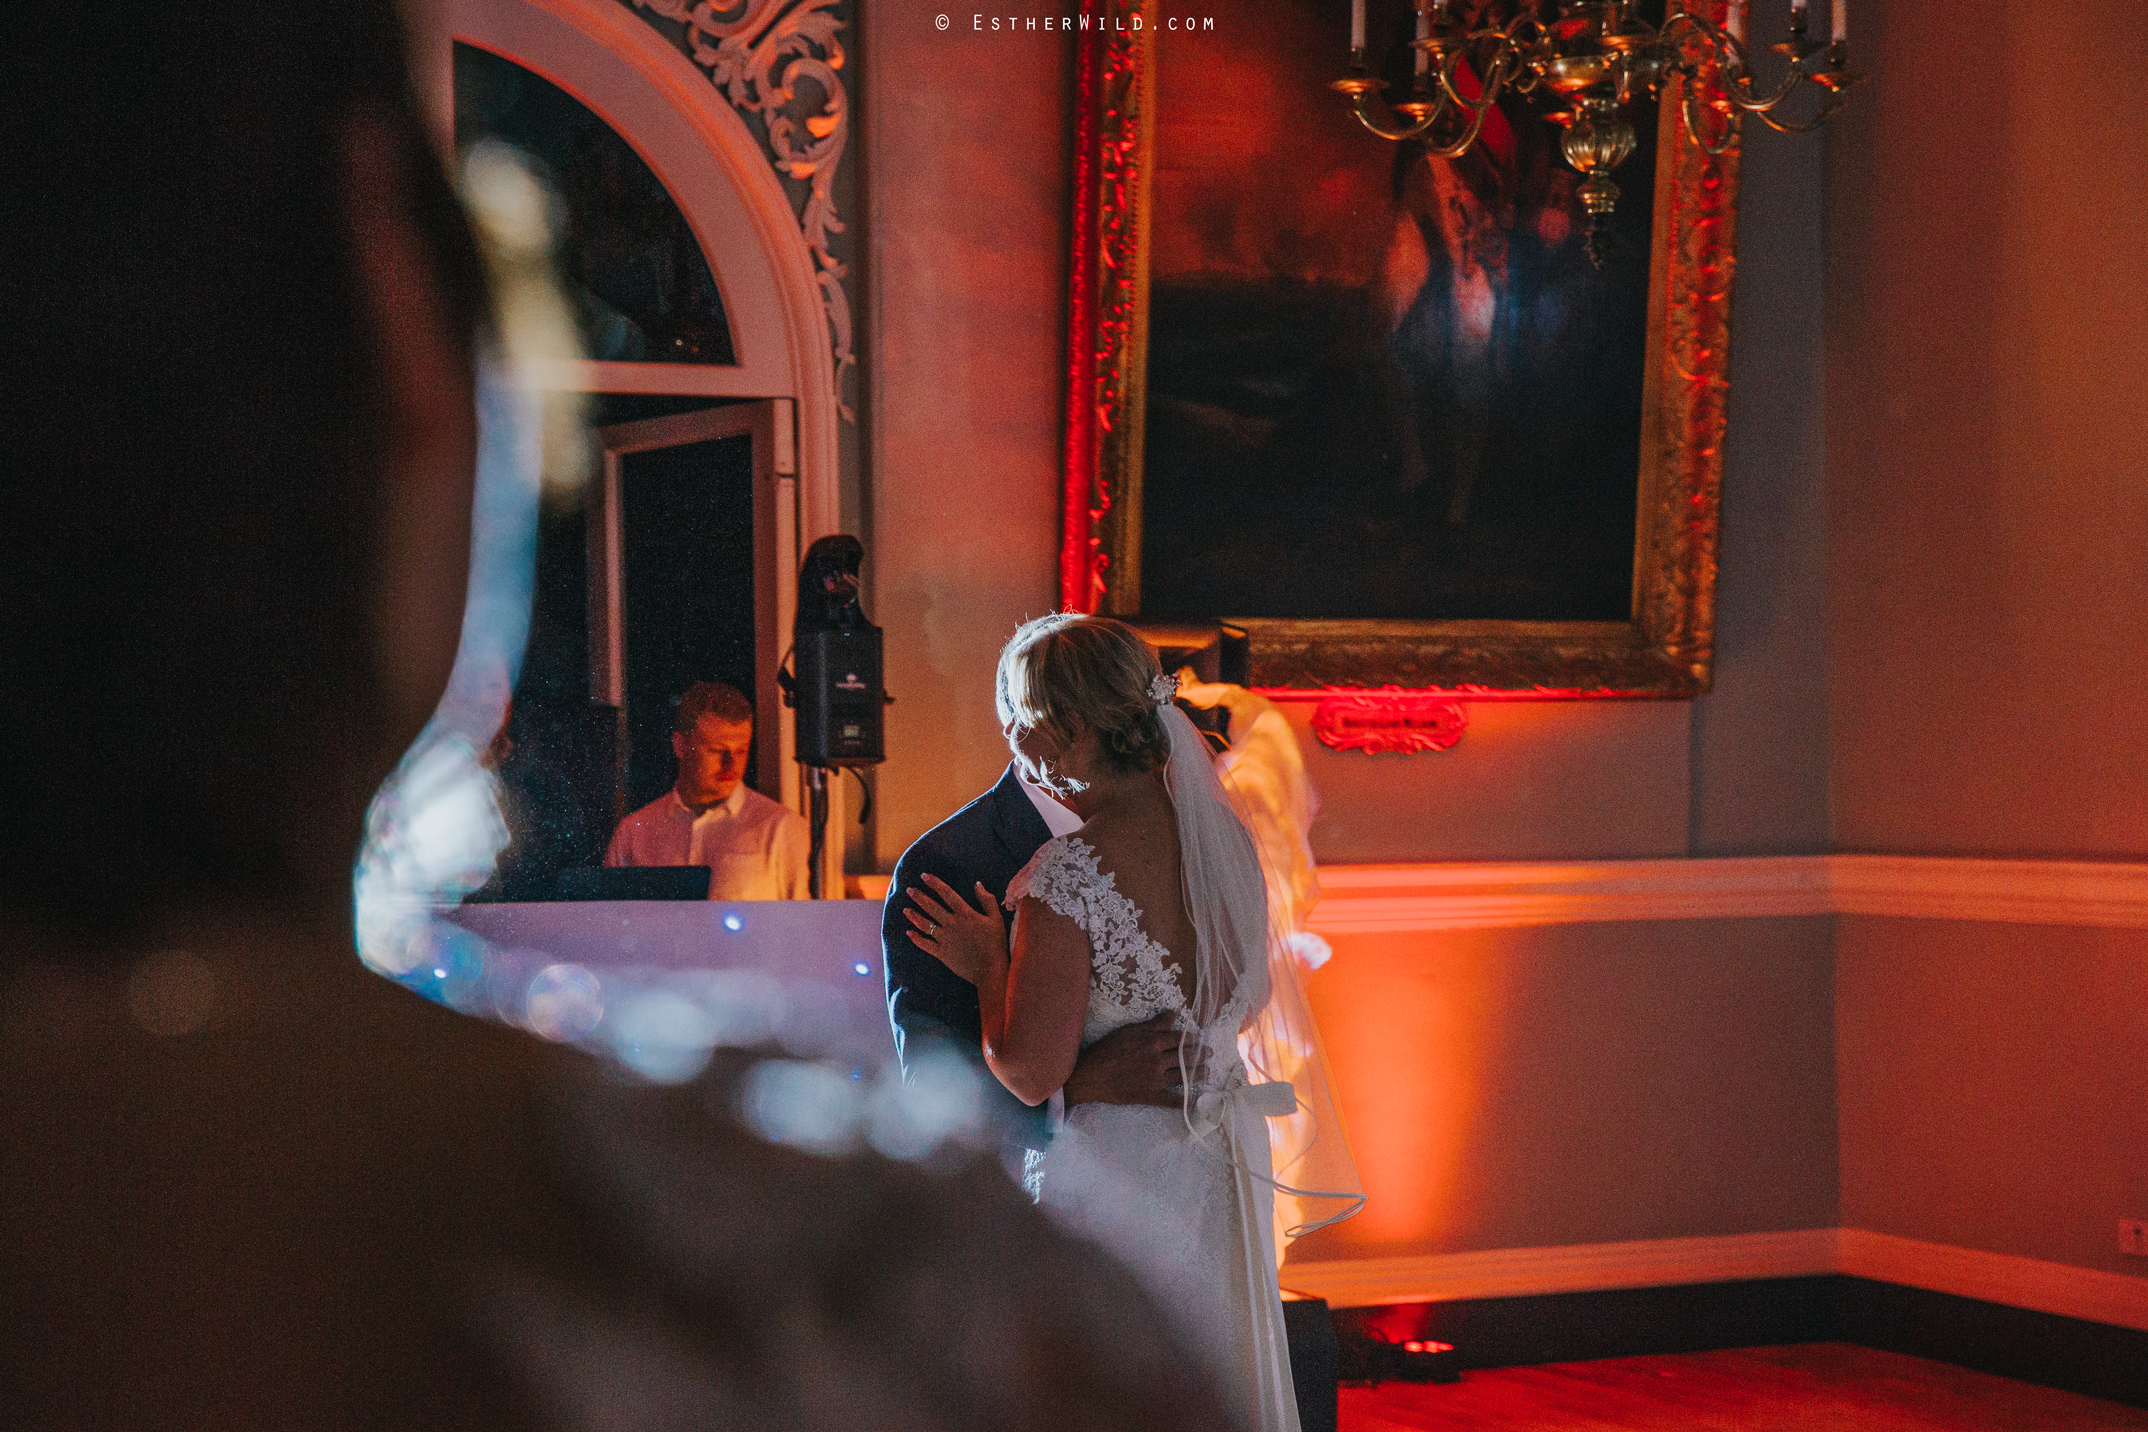 Wedding_Kings_Lynn_Town_Hall_Norfolk_Photographer_Esther_Wild_IMG_1825_IMGL0835.jpg